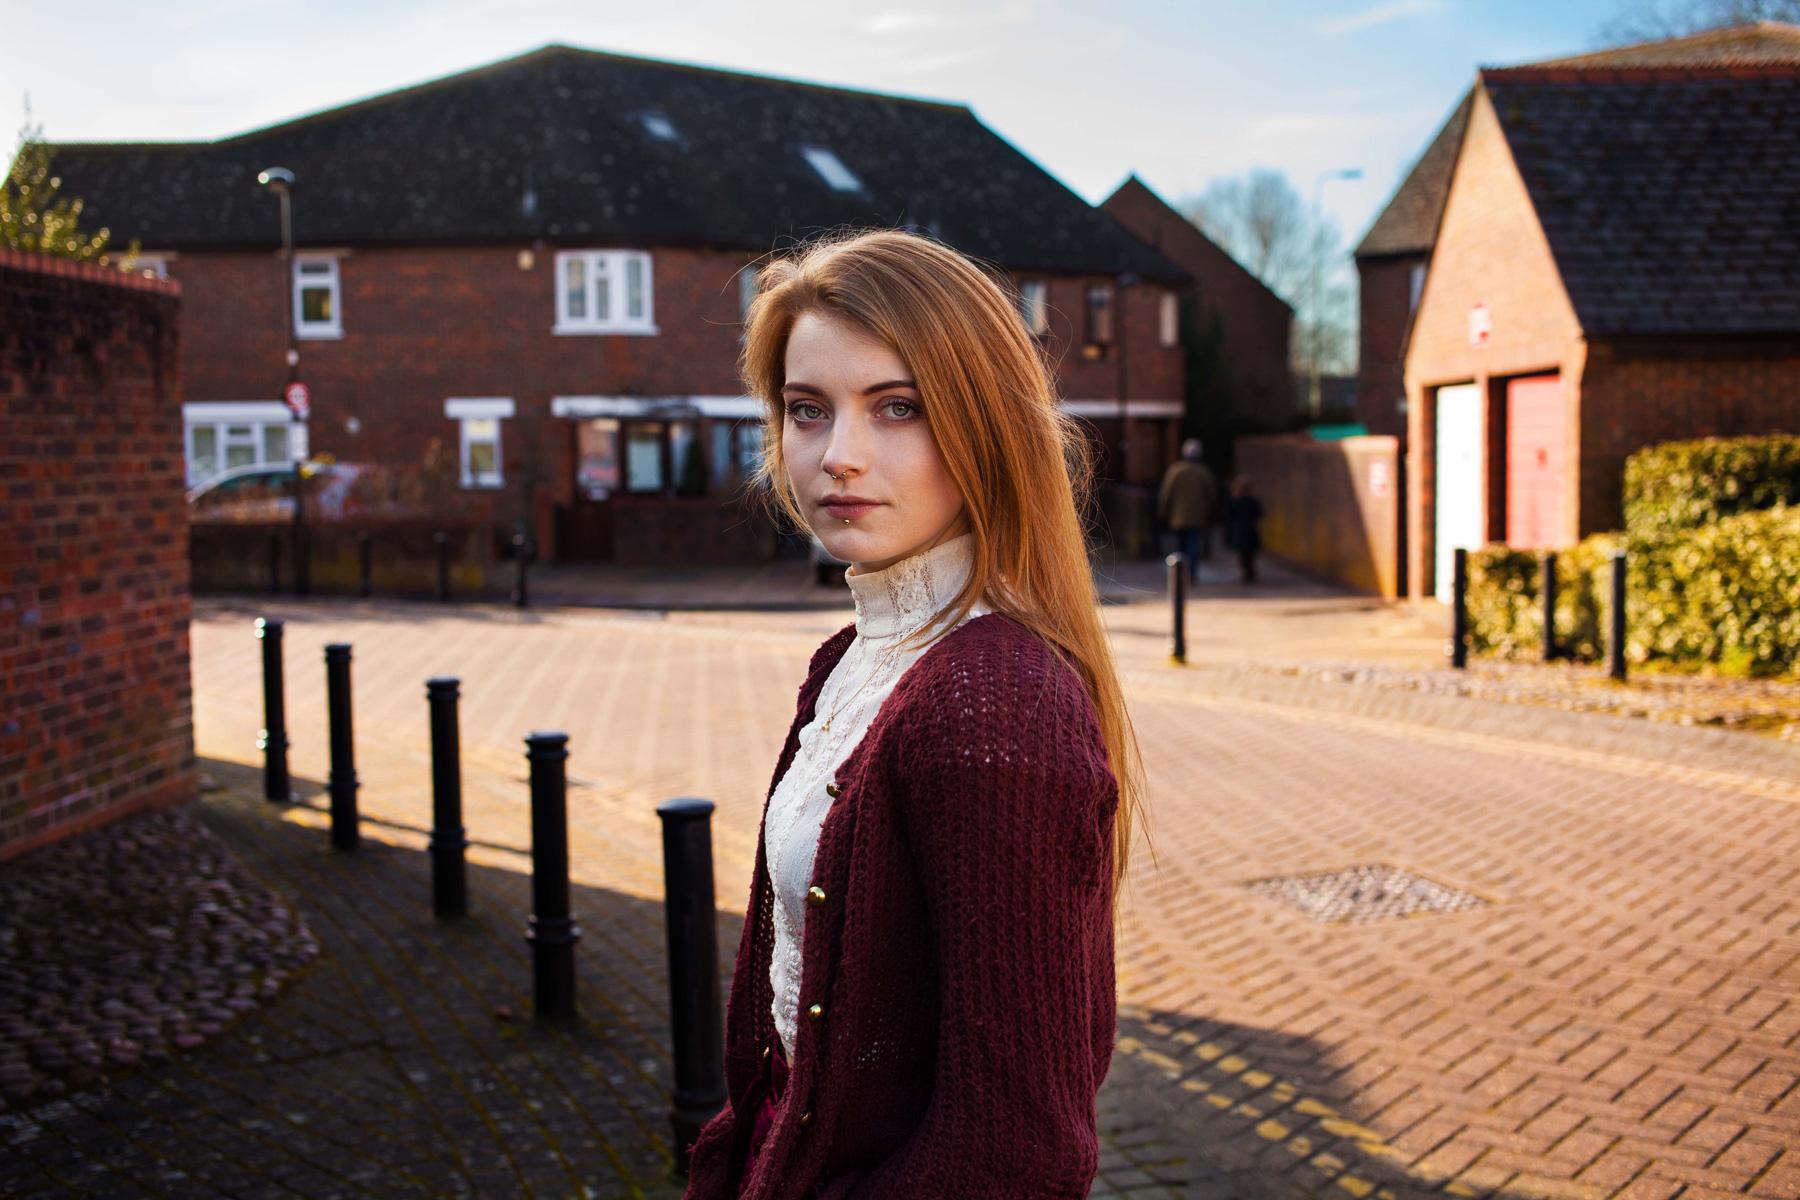 Mihaela-Noroc-Atlas-of-Beauty-Oxford-UK